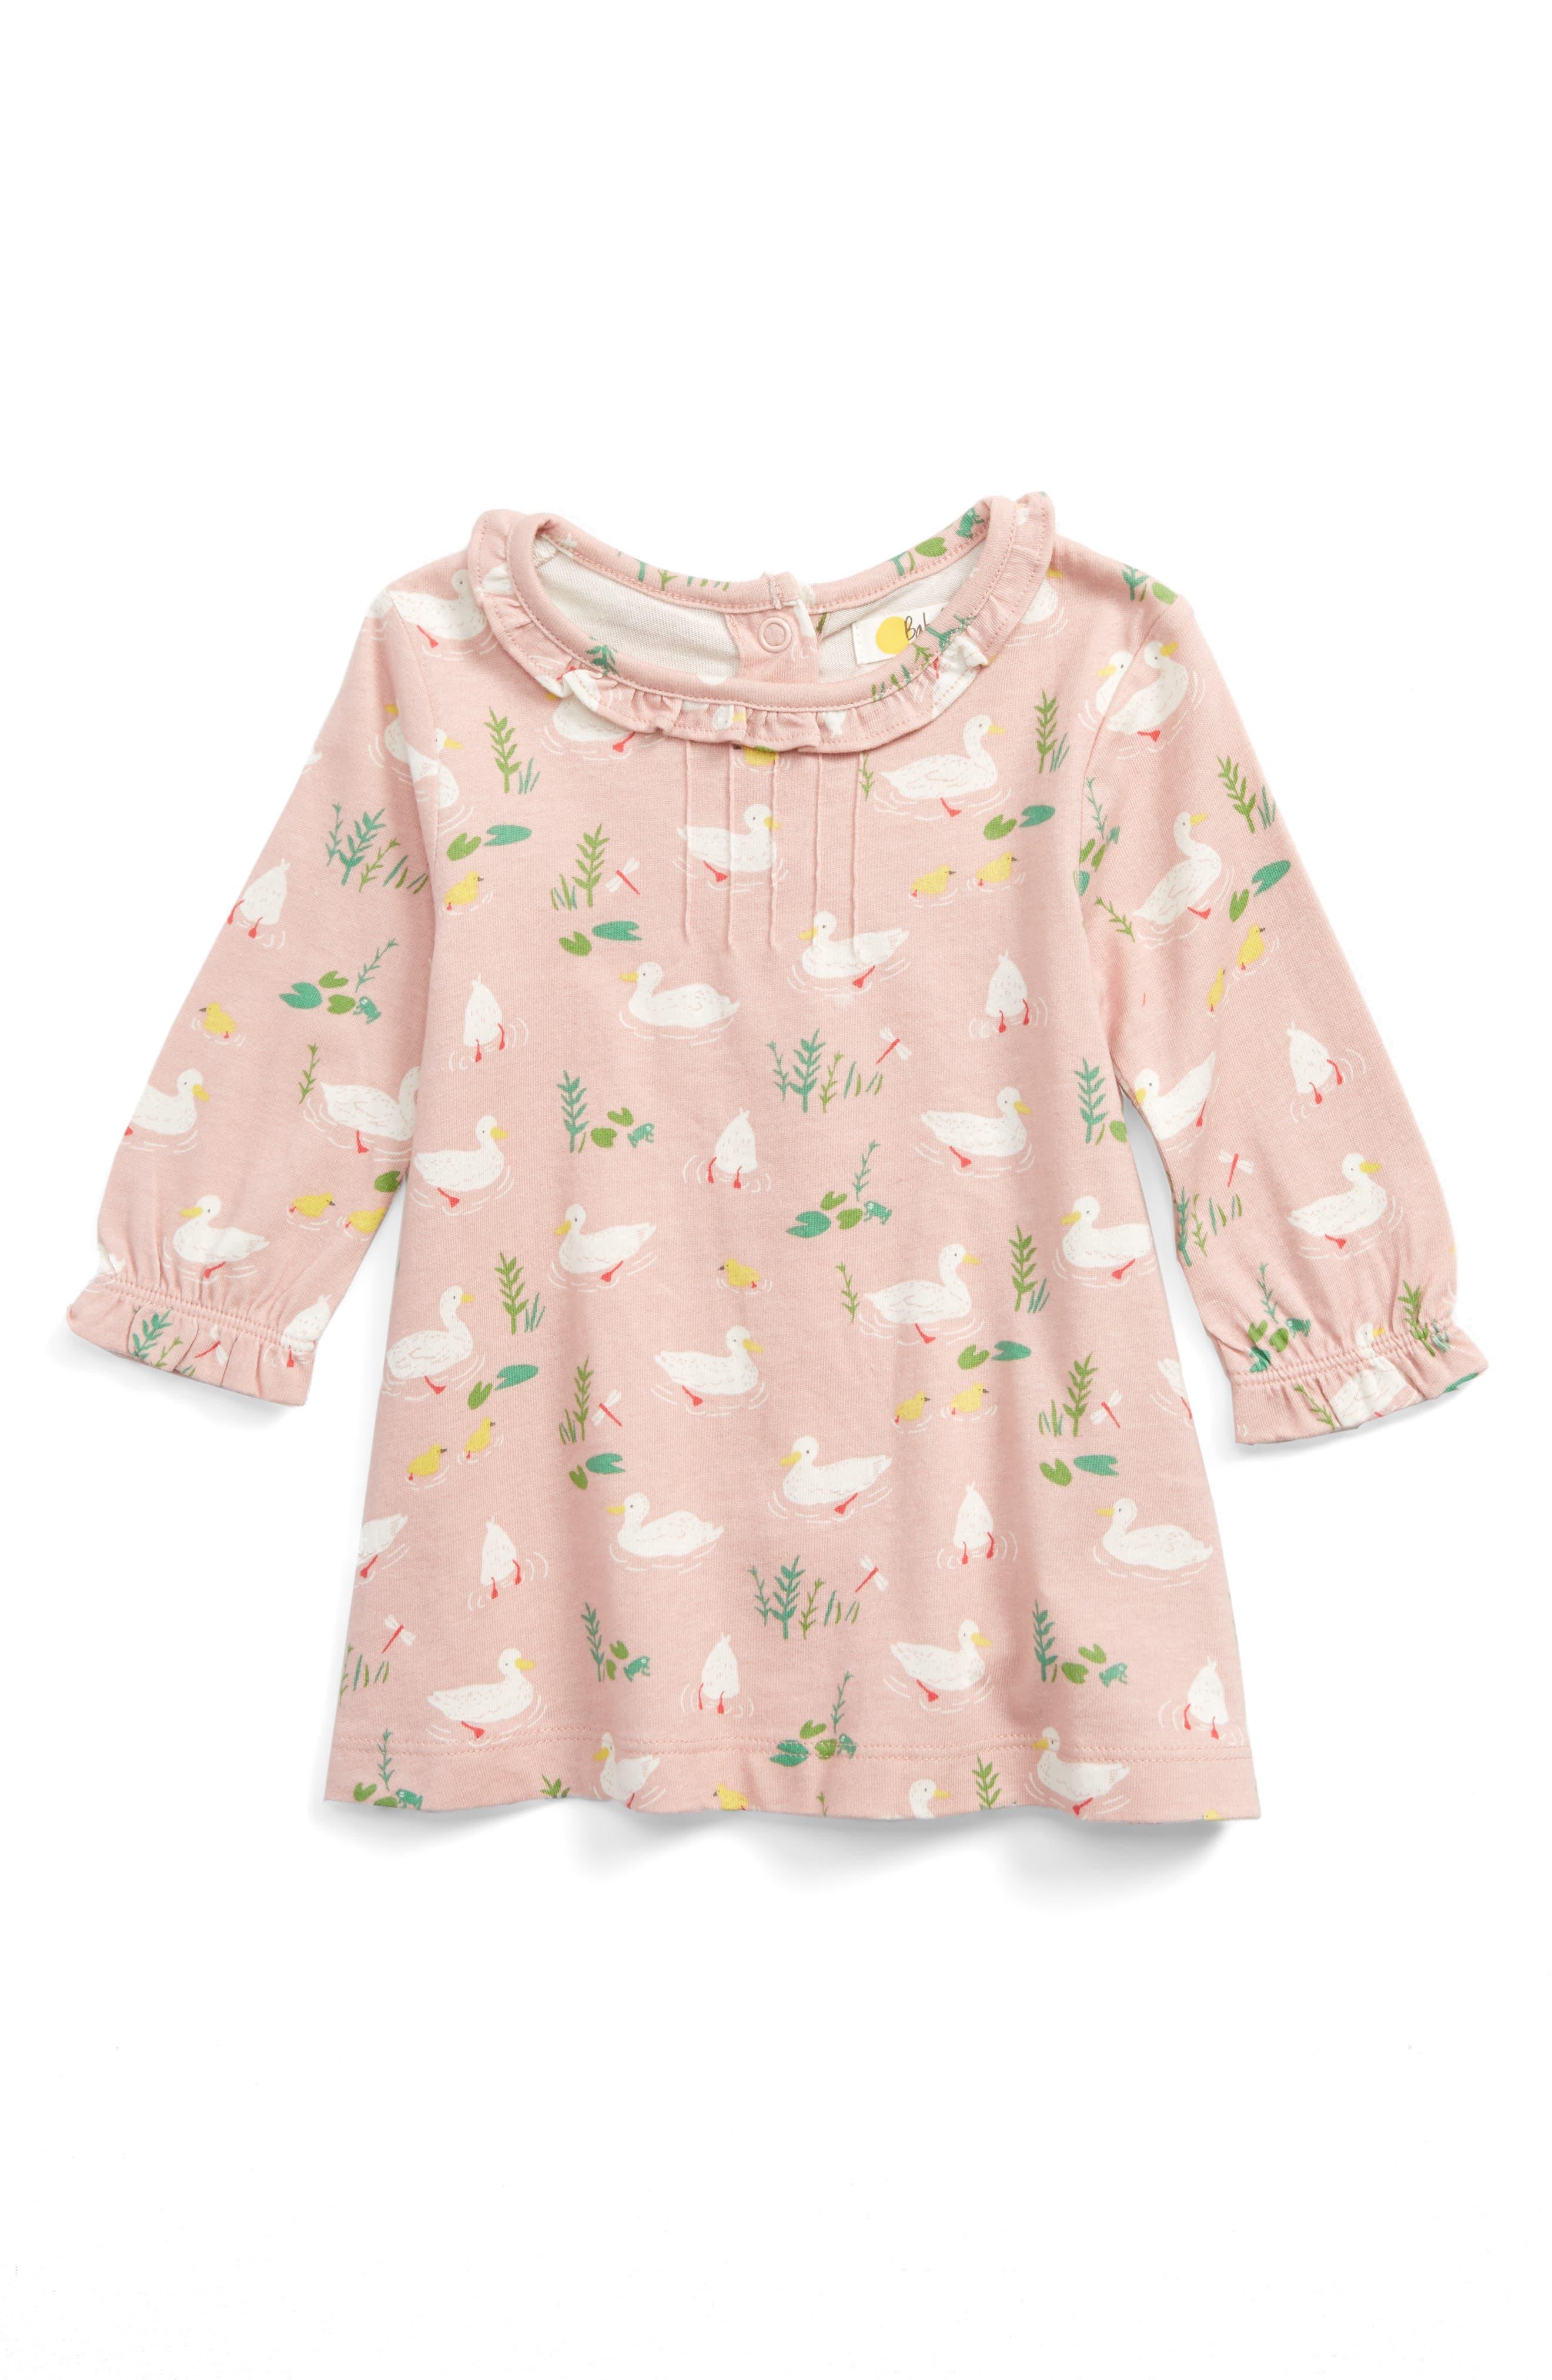 Alternate Image 1 Selected - Mini Boden Pretty Print Jersey Dress (Baby Girls & Toddler Girls)